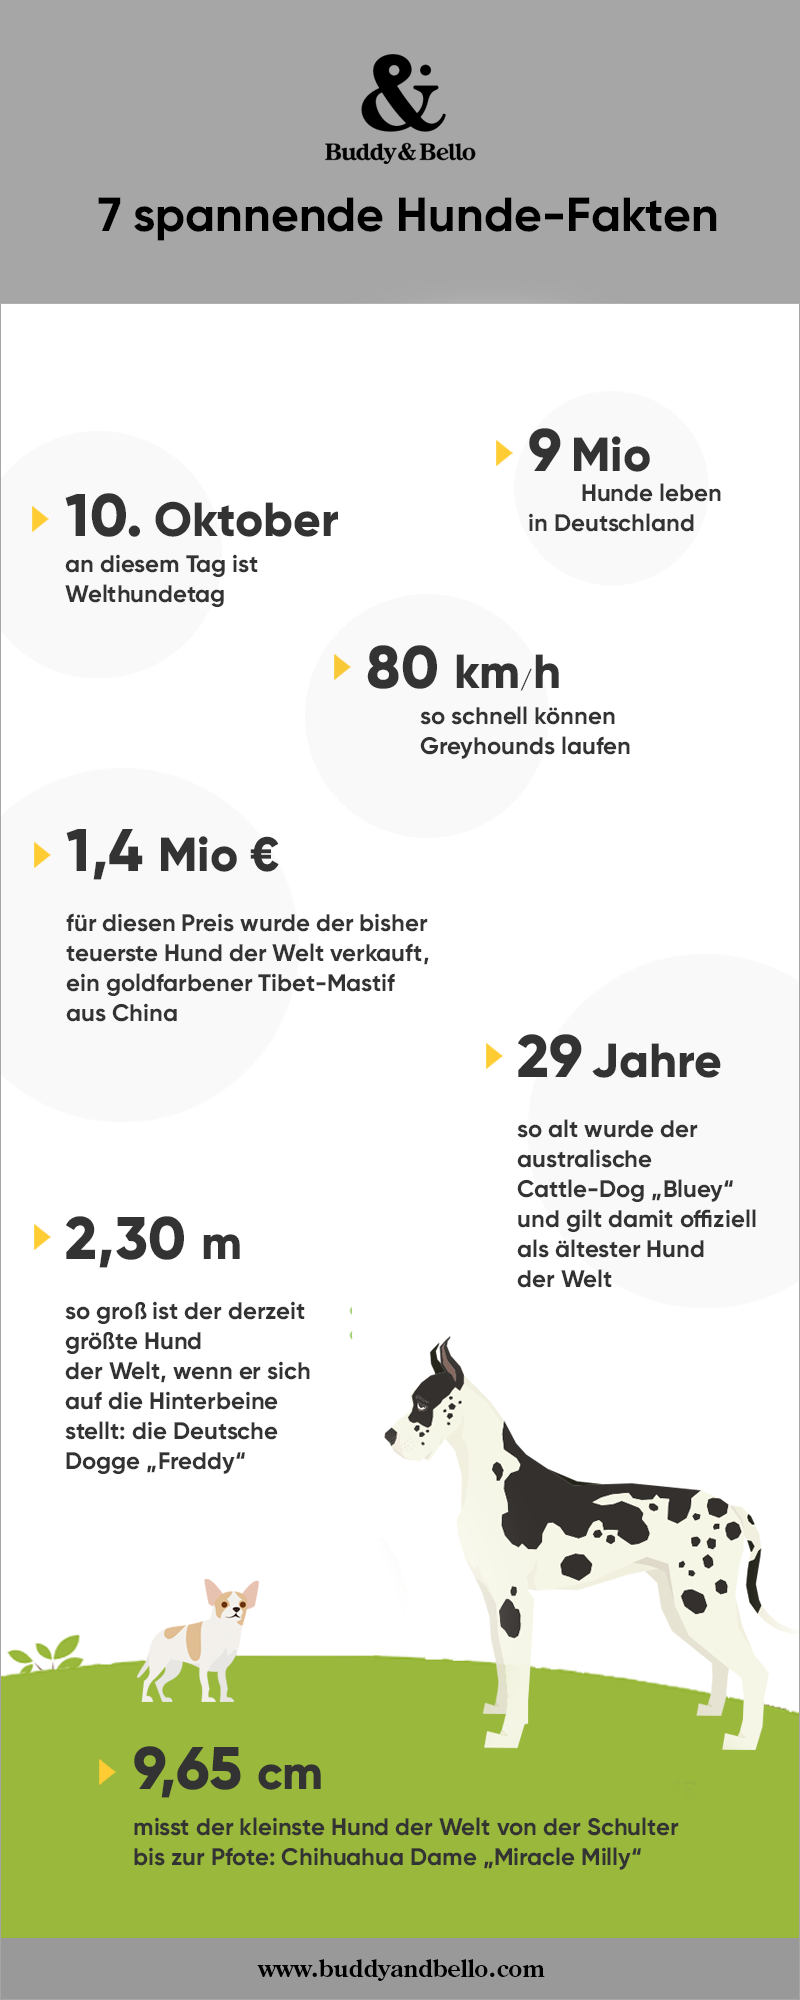 Buddy_and_Bello_Infografik_Hunde_in_Zahlen.png